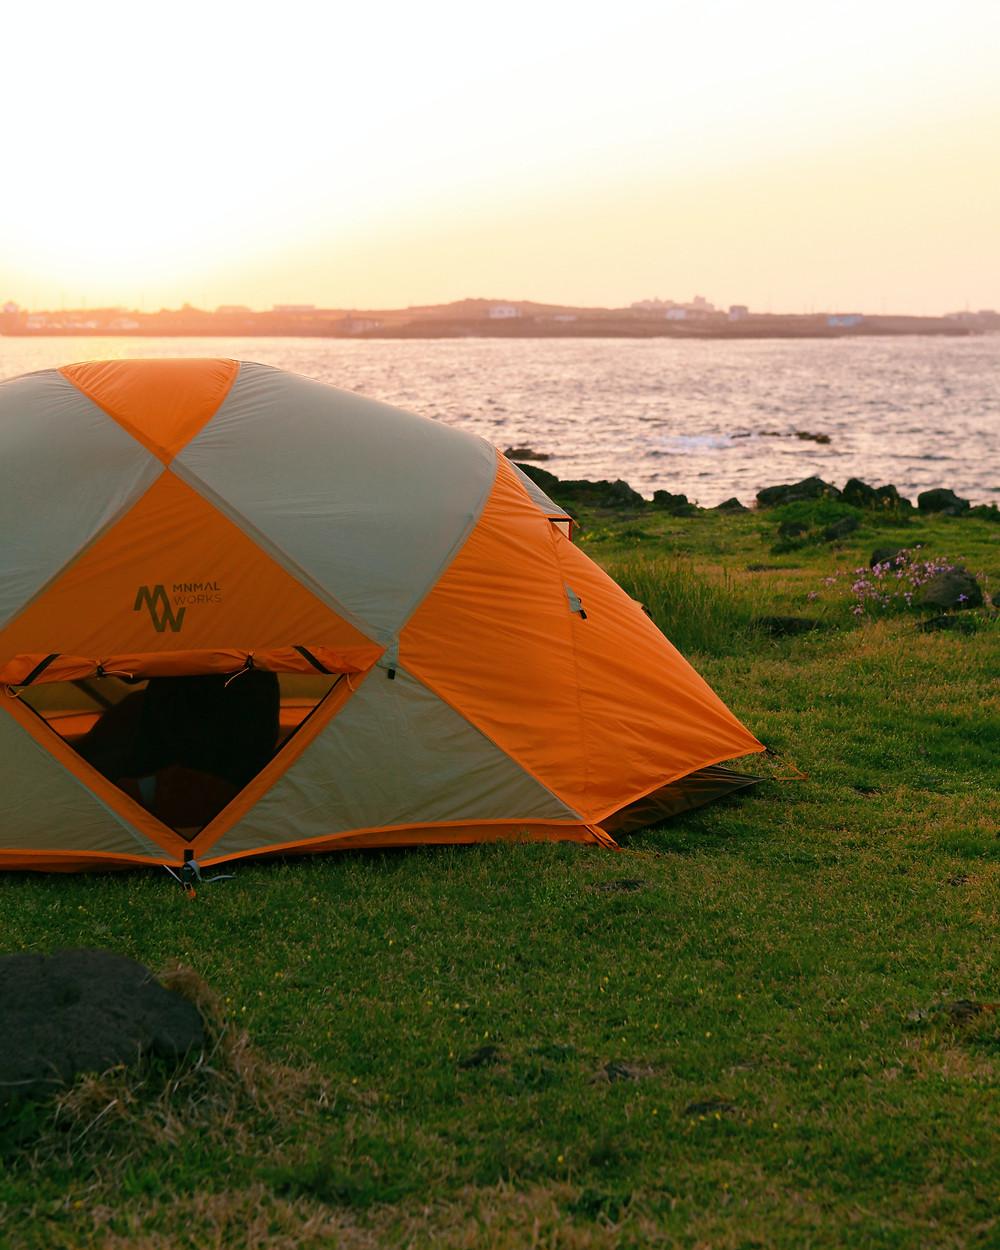 Orange and gray Mnmal Works Tent in coastal field near the shoreline under setting sun